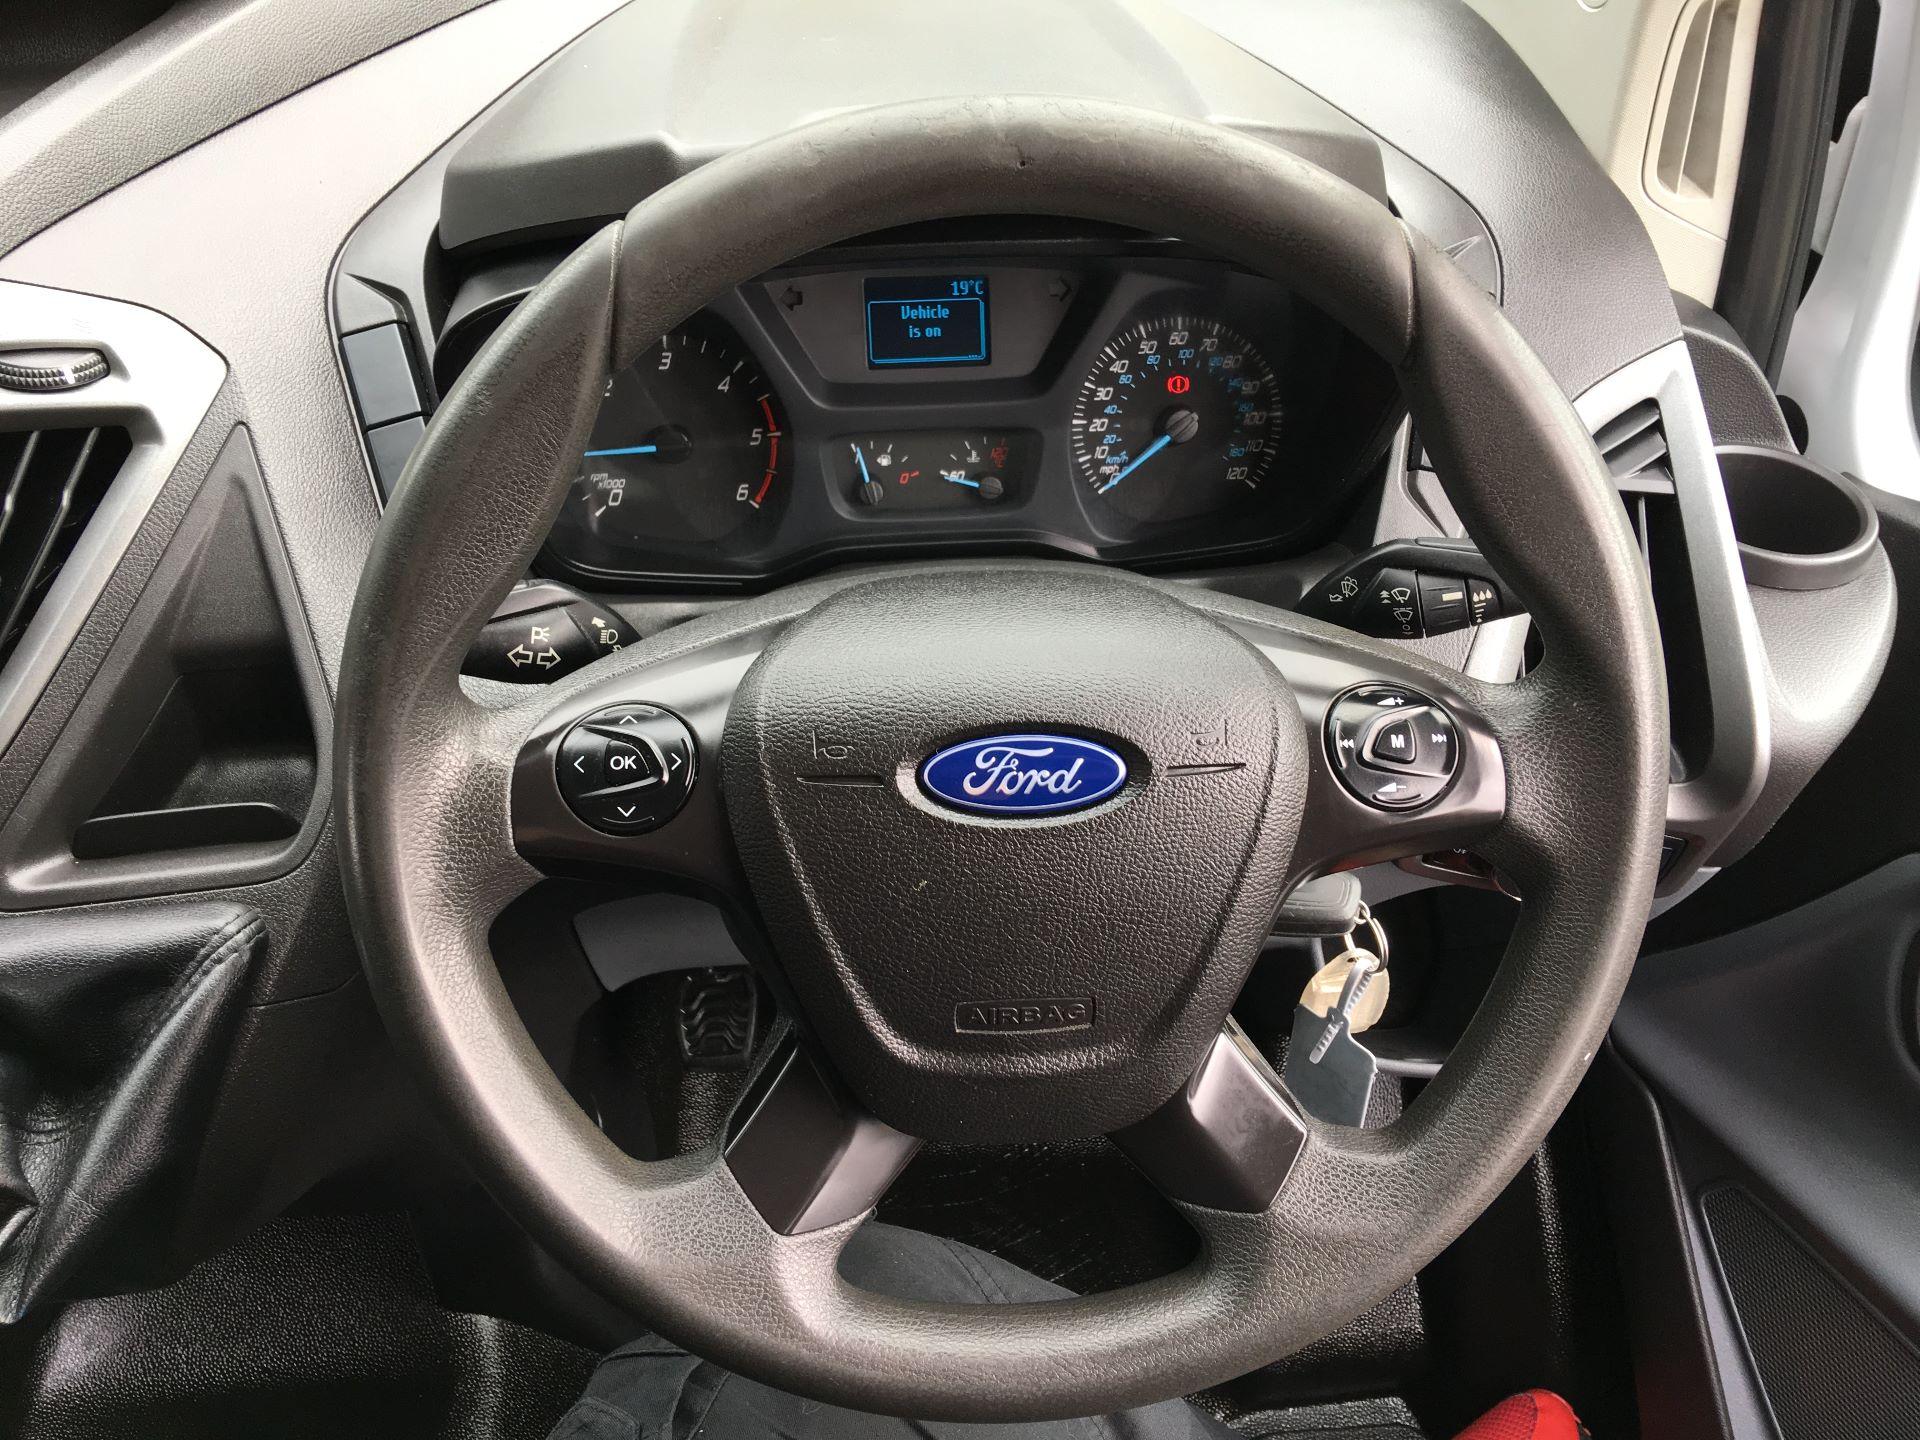 2016 Ford Transit Custom 290 L1 DIESEL FWD 2.0 TDCI 105PS HIGH ROOF VAN EURO 6 (SK66VKG) Image 5